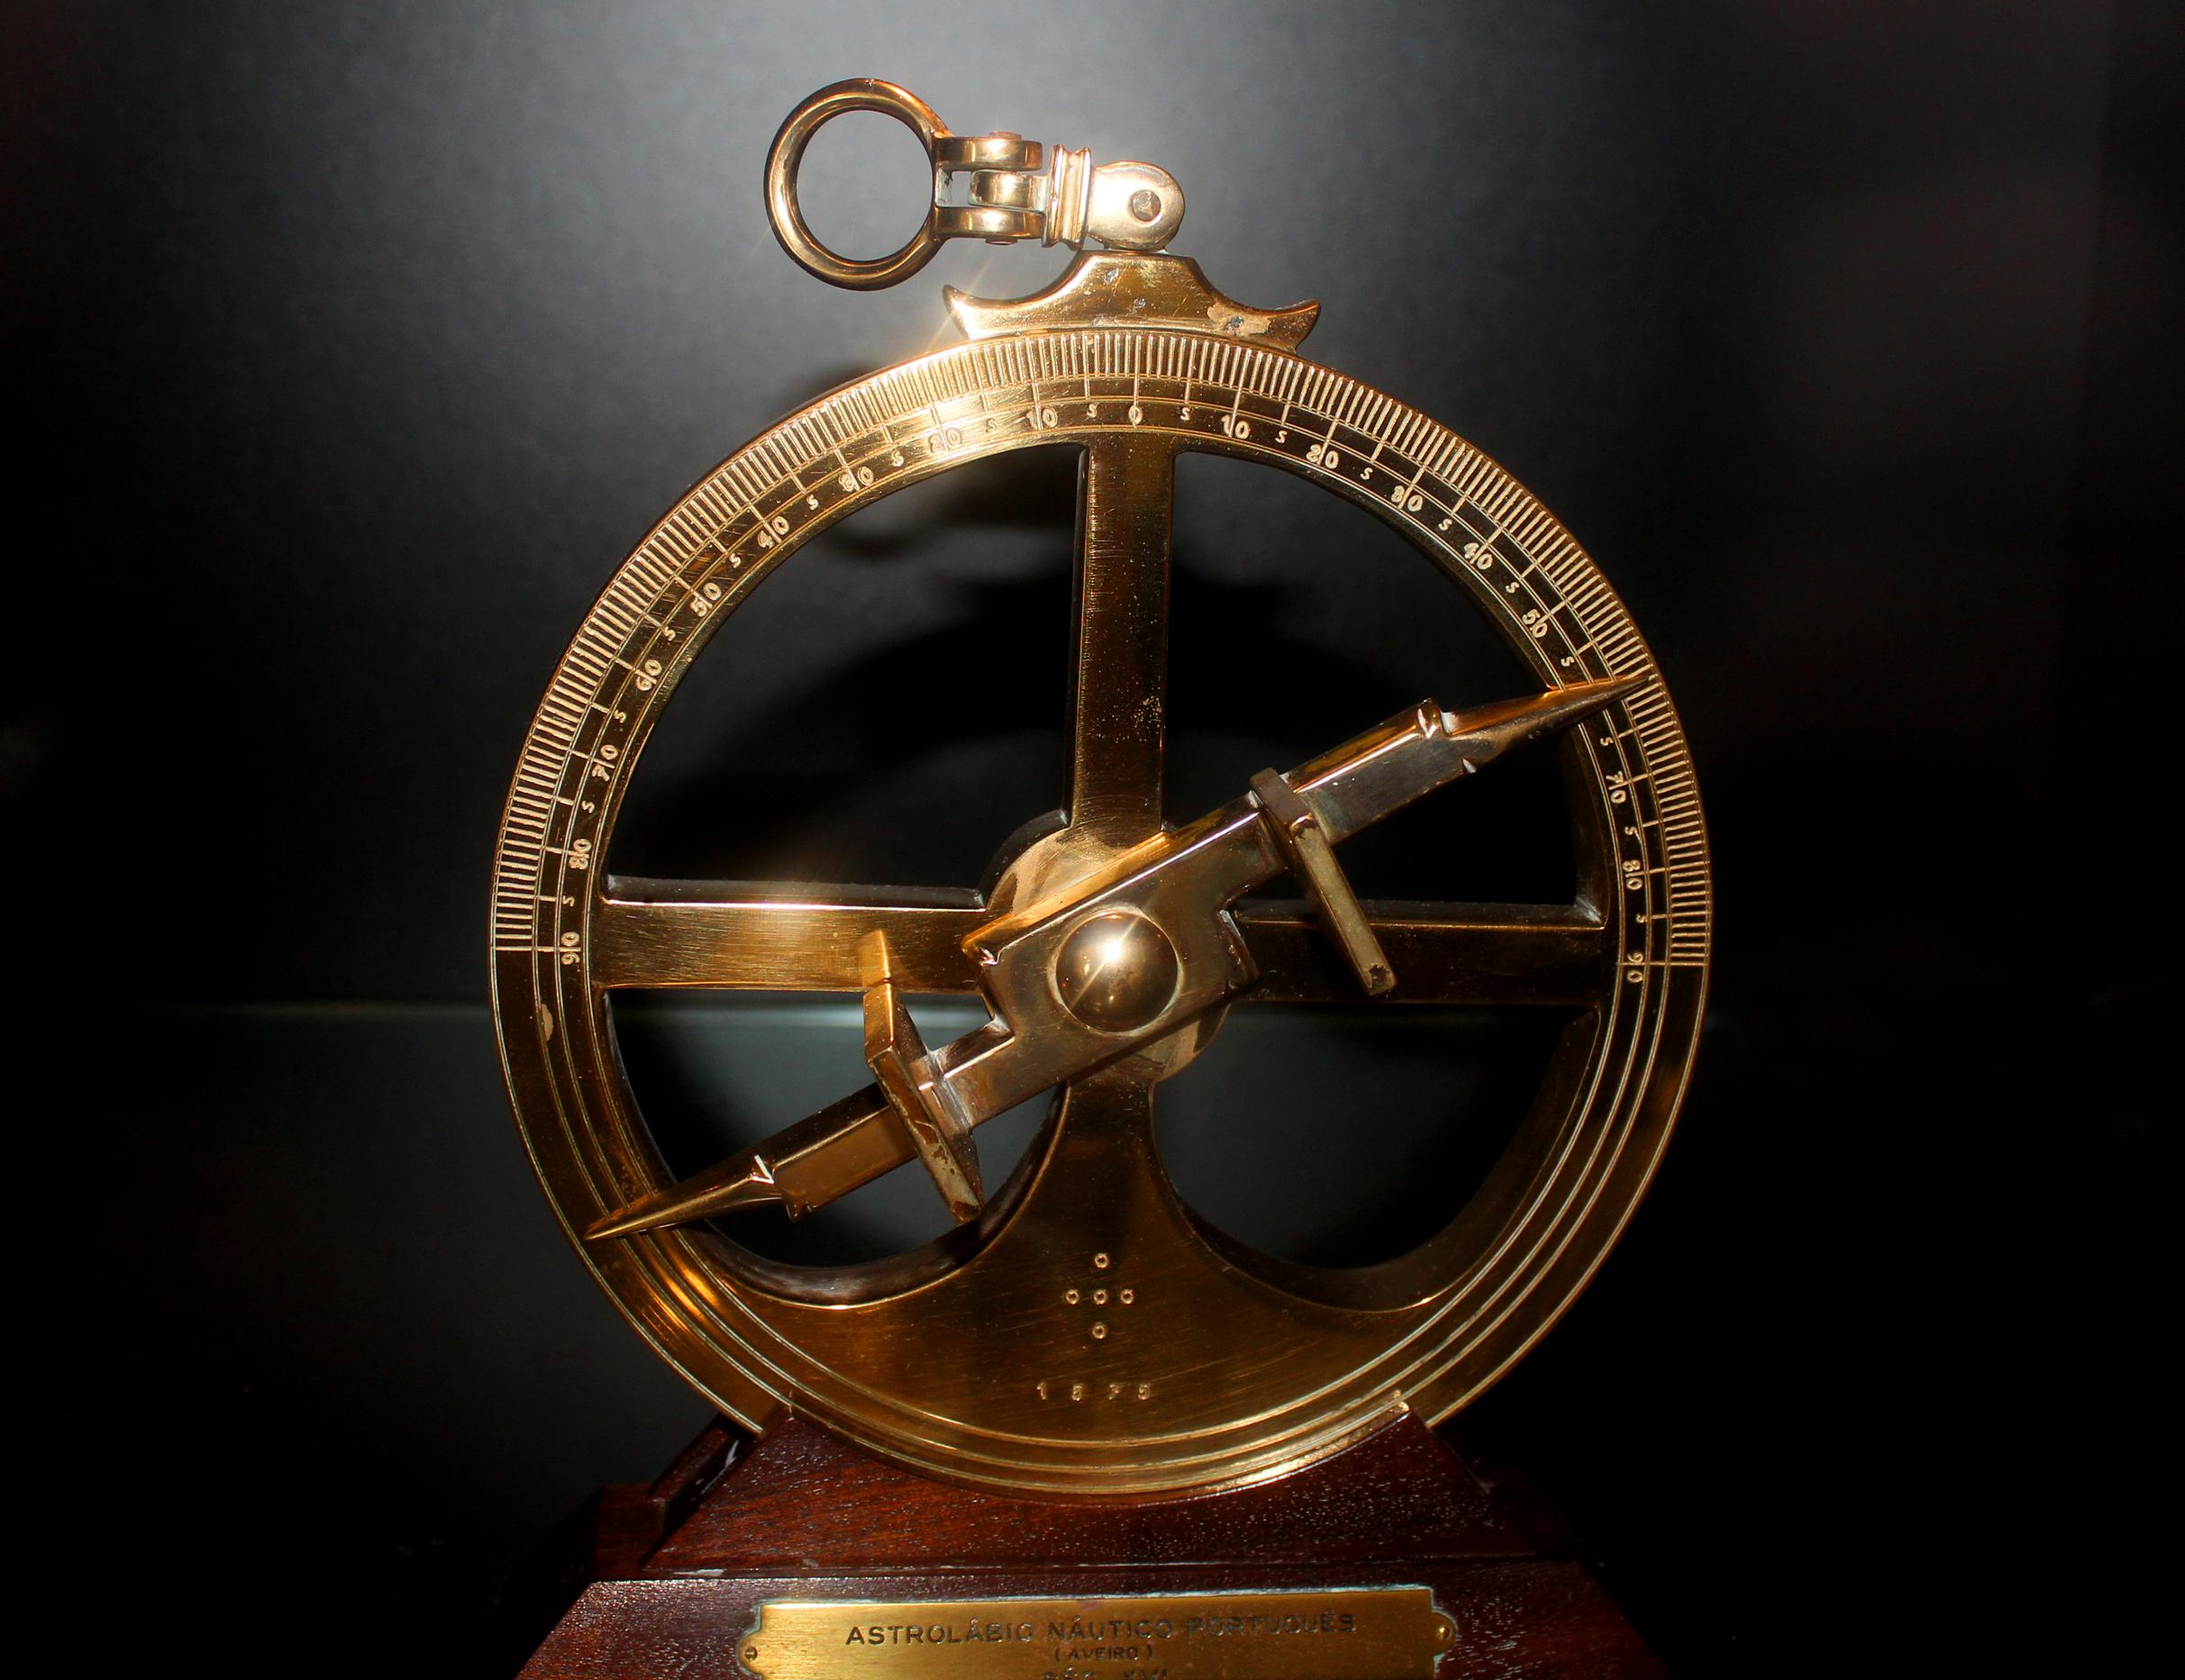 16th-century portuguese nautical astrolabe - european age of discovery photo